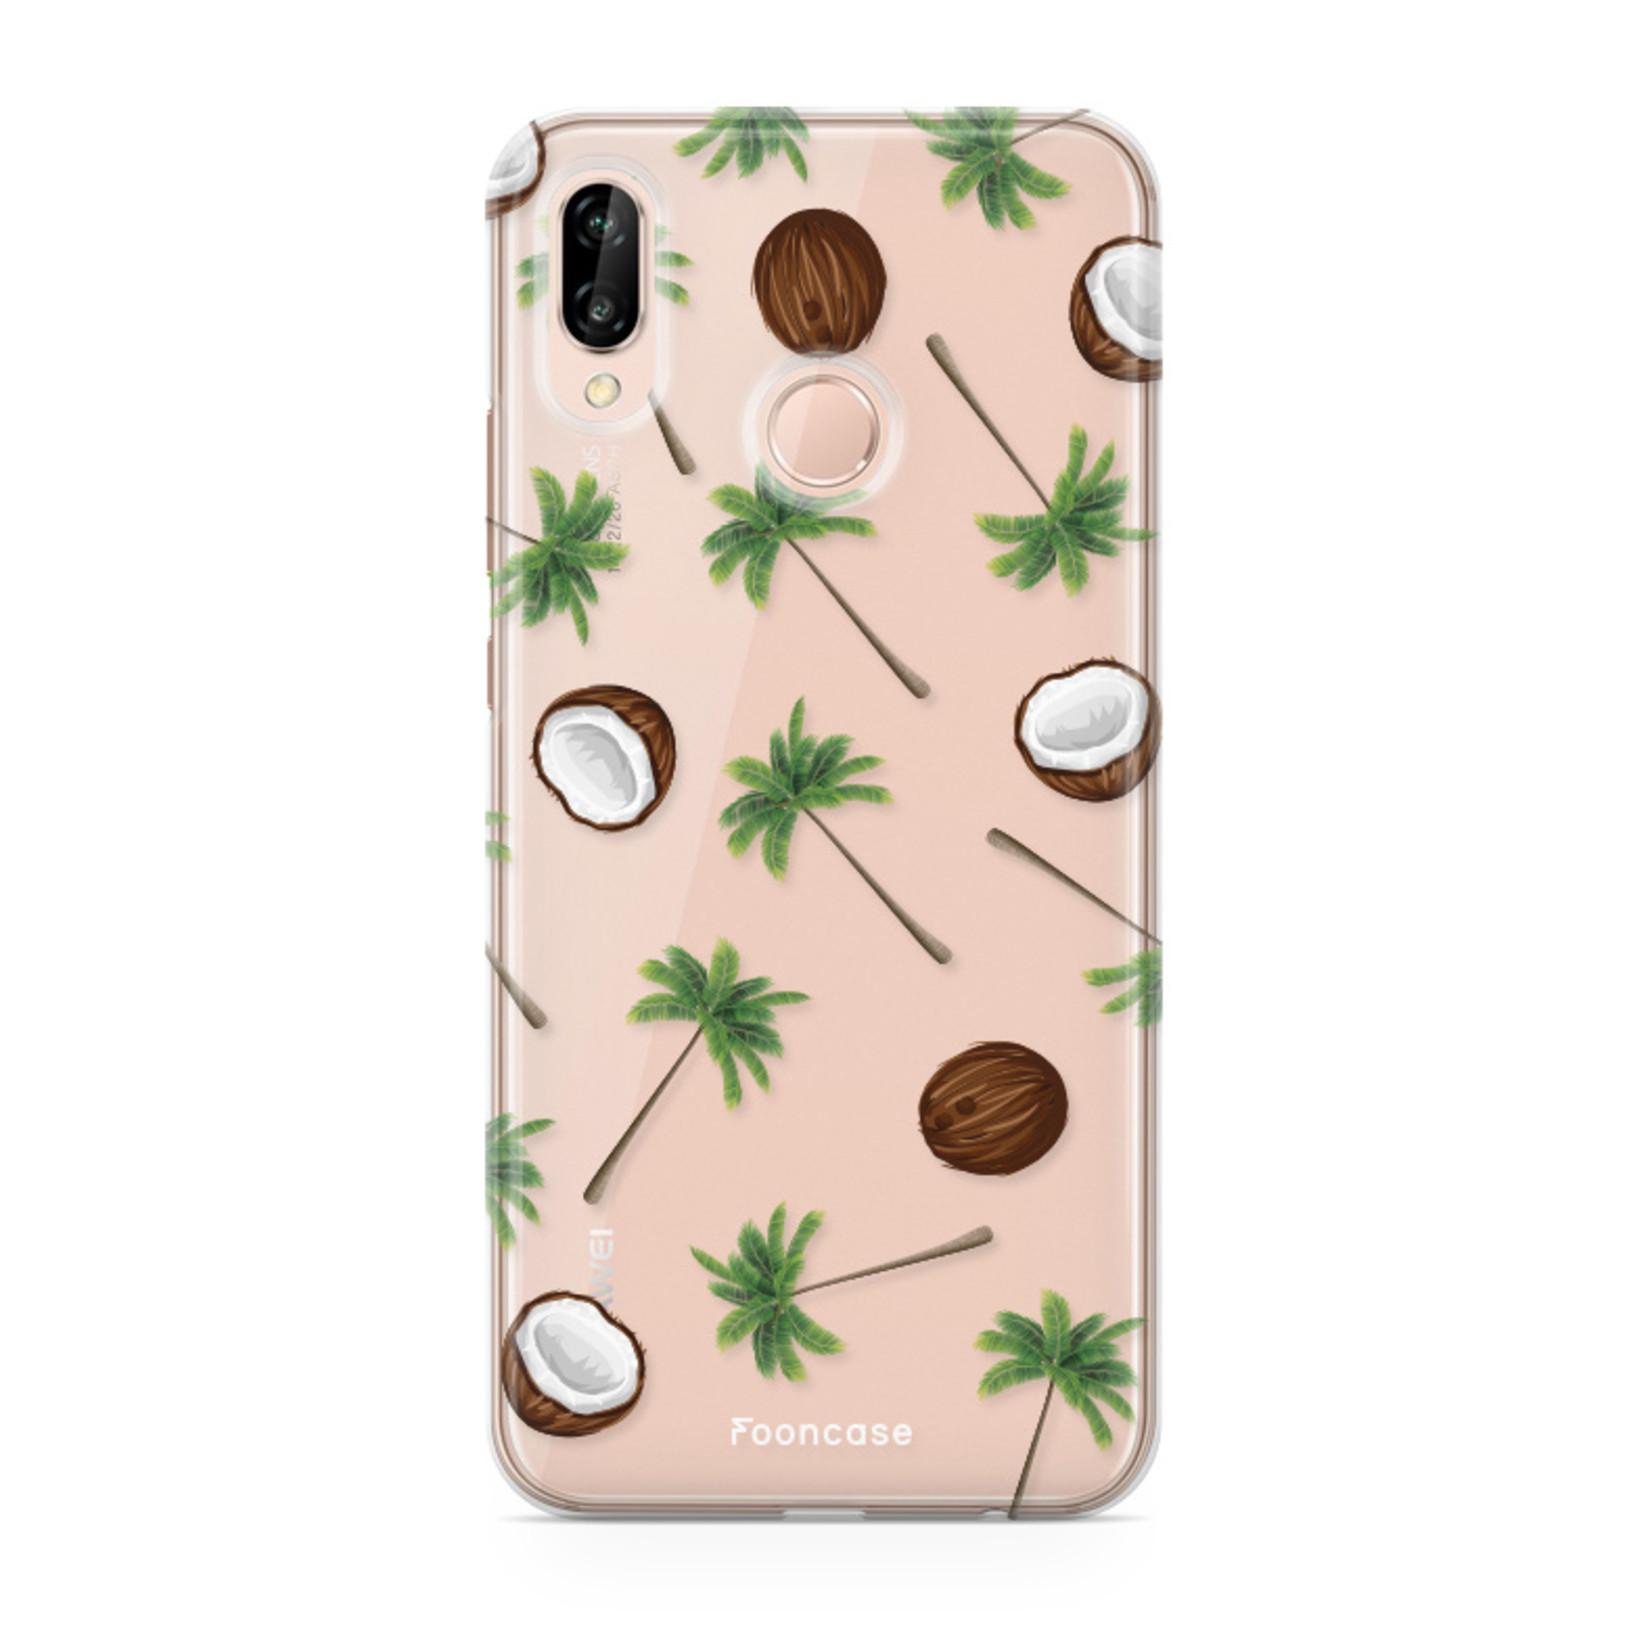 FOONCASE Huawei P20 Lite hoesje TPU Soft Case - Back Cover - Coco Paradise / Kokosnoot / Palmboom